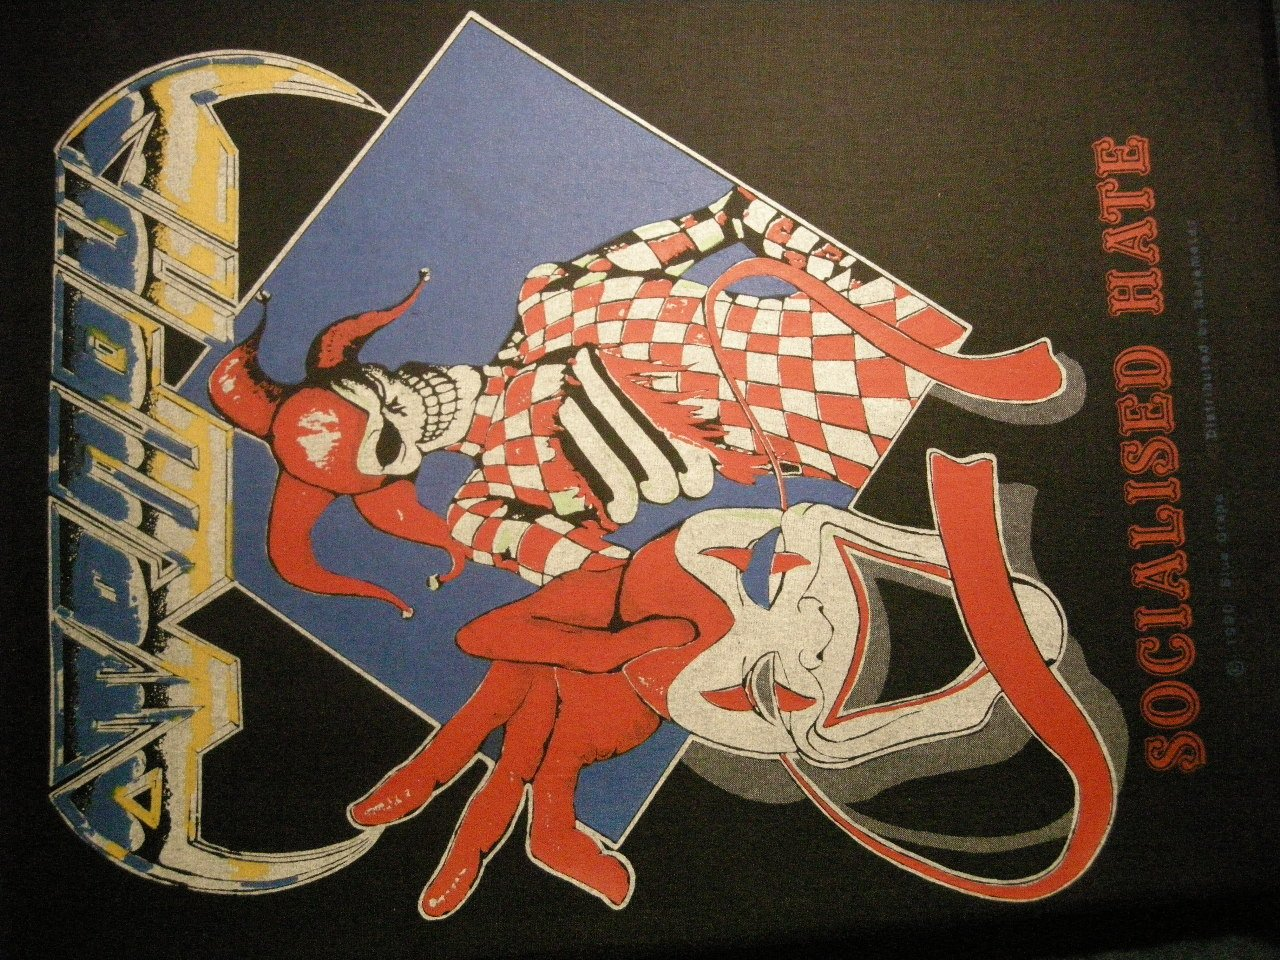 ATROPHY BACKPATCH Socialized Hate clown jester patch IMPORT